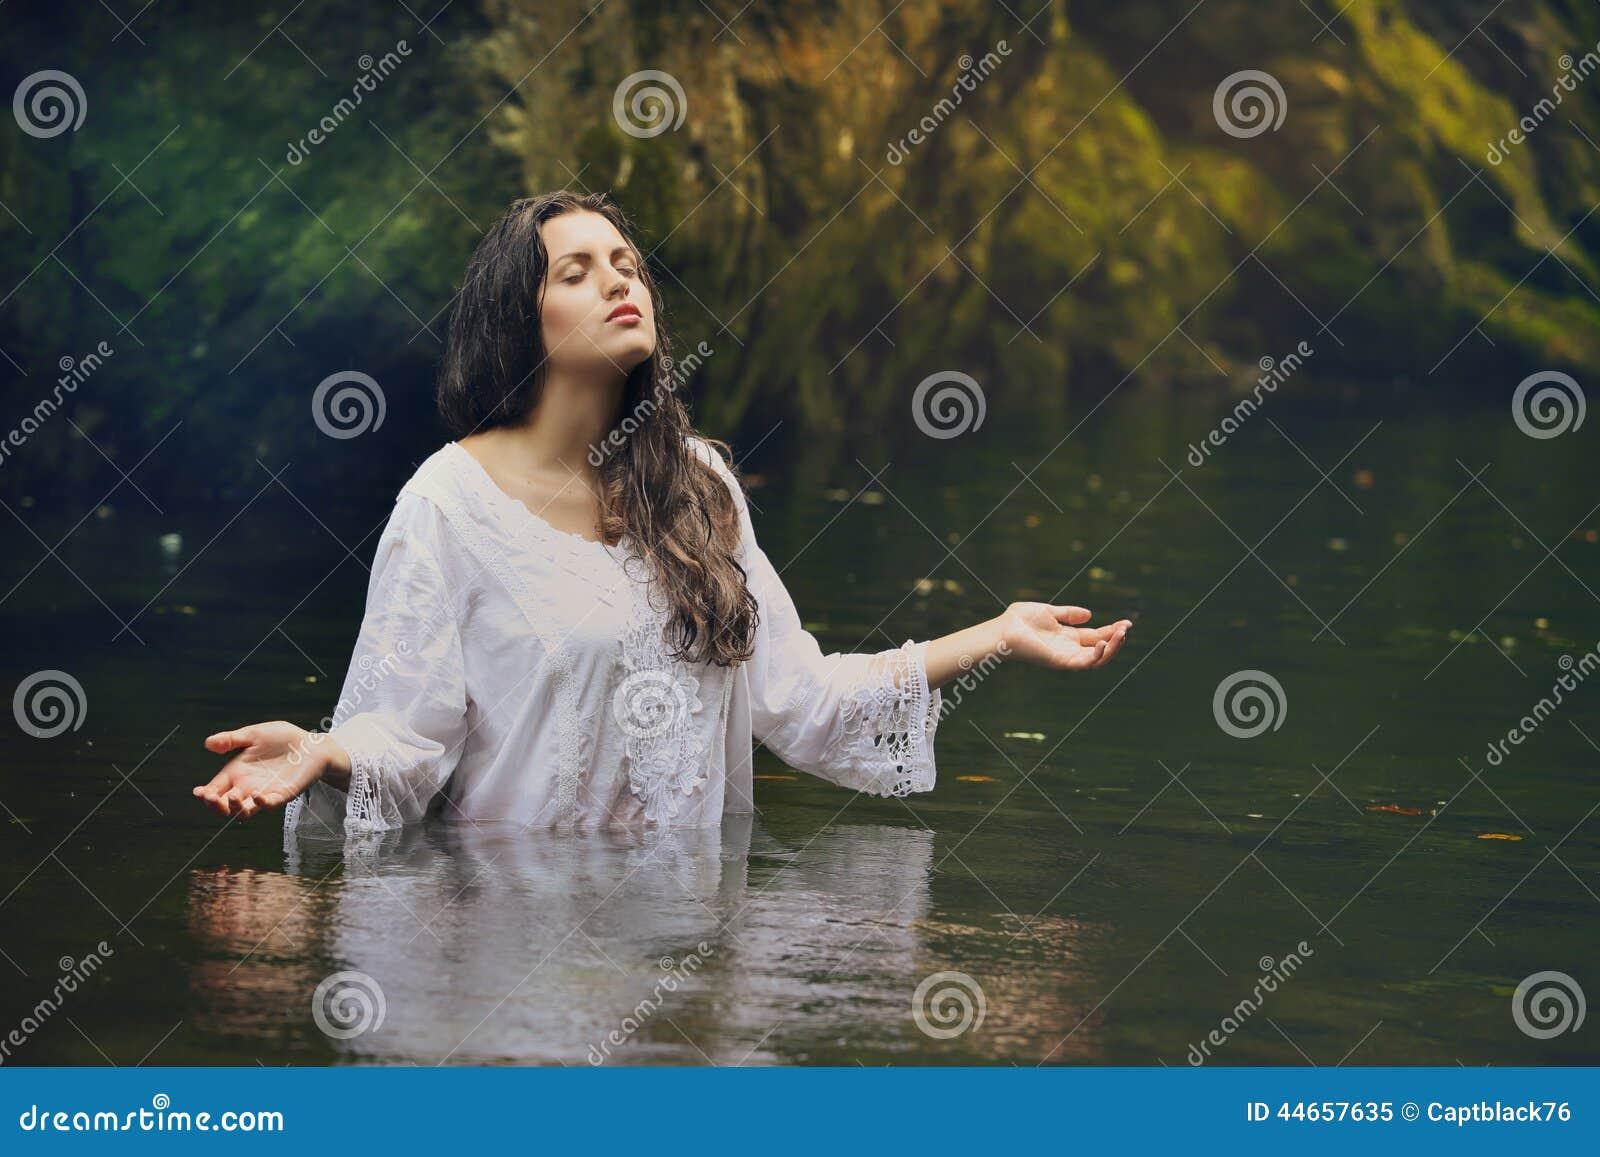 Beautiful Toplesswomen In Nature